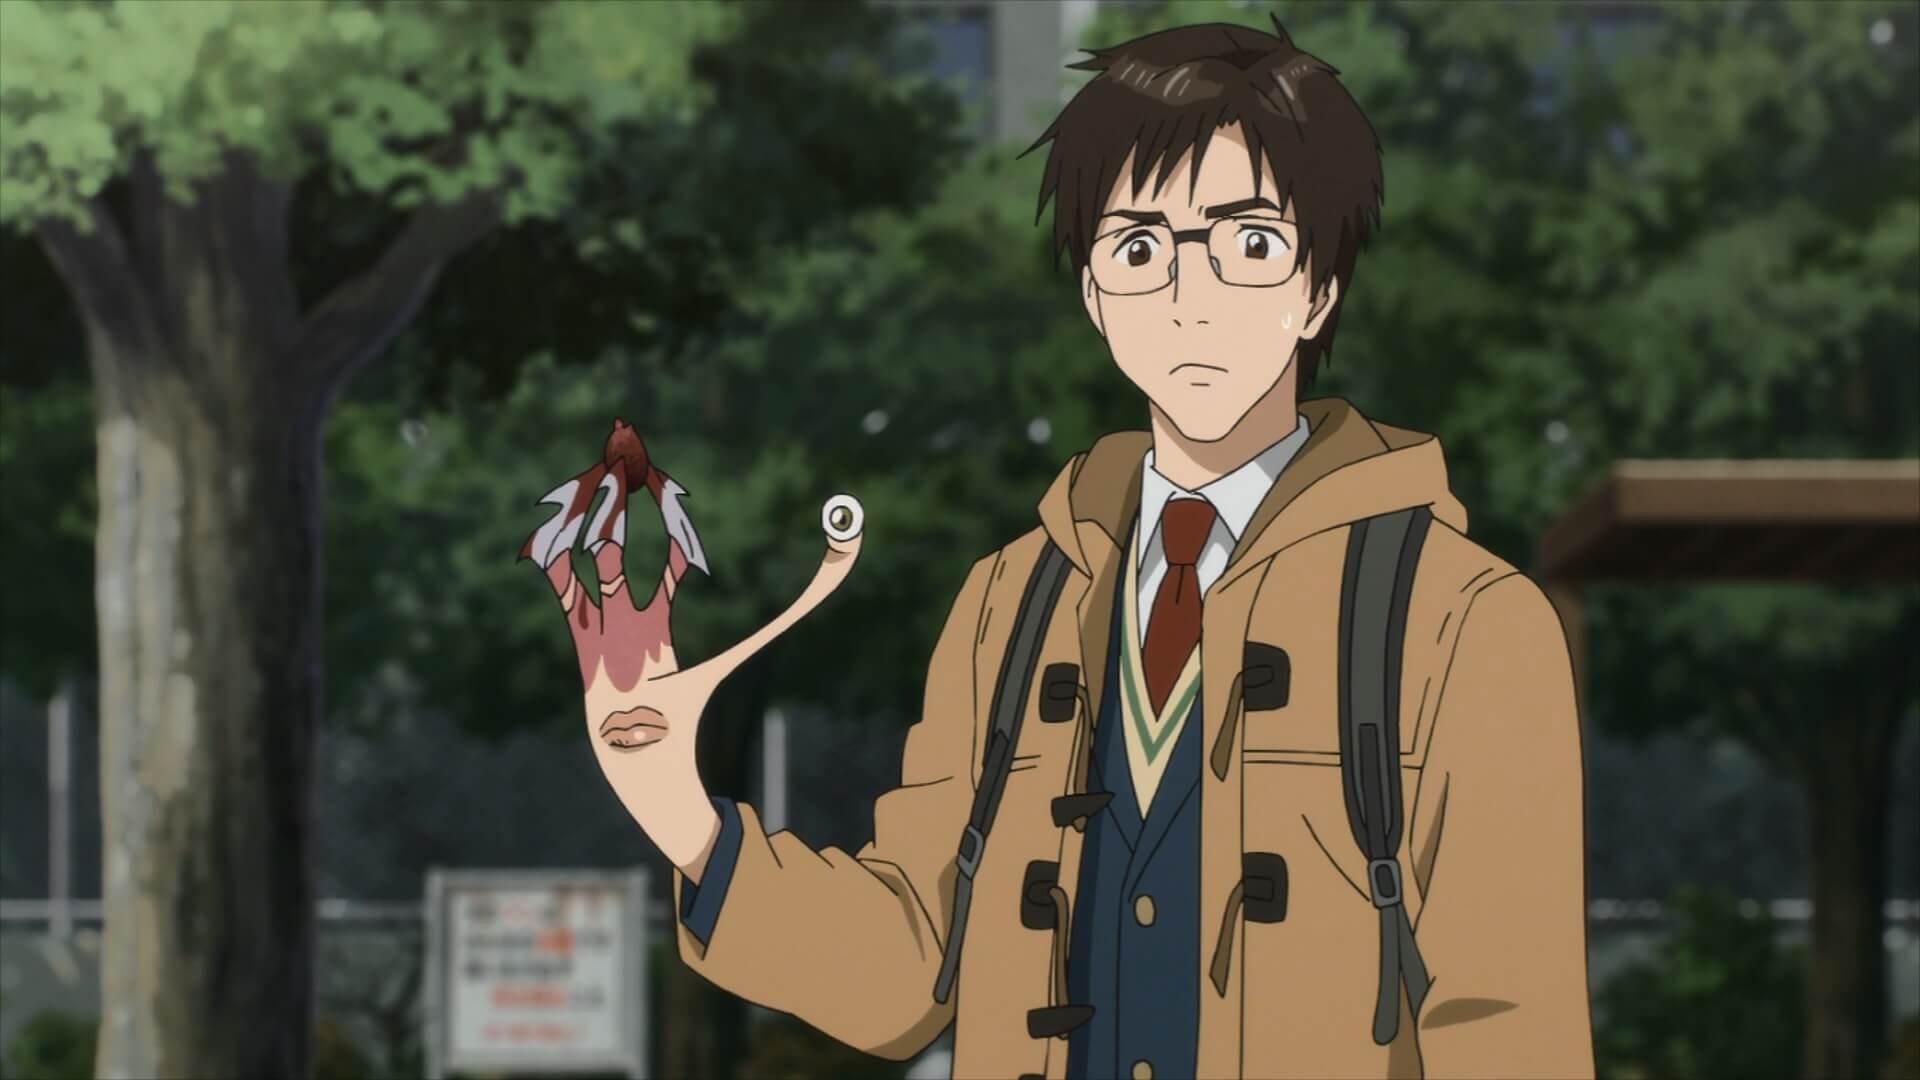 Kết quả hình ảnh cho Kiseijuu: Sei no Kakuritsu (Parasyte -the maxim-) anime